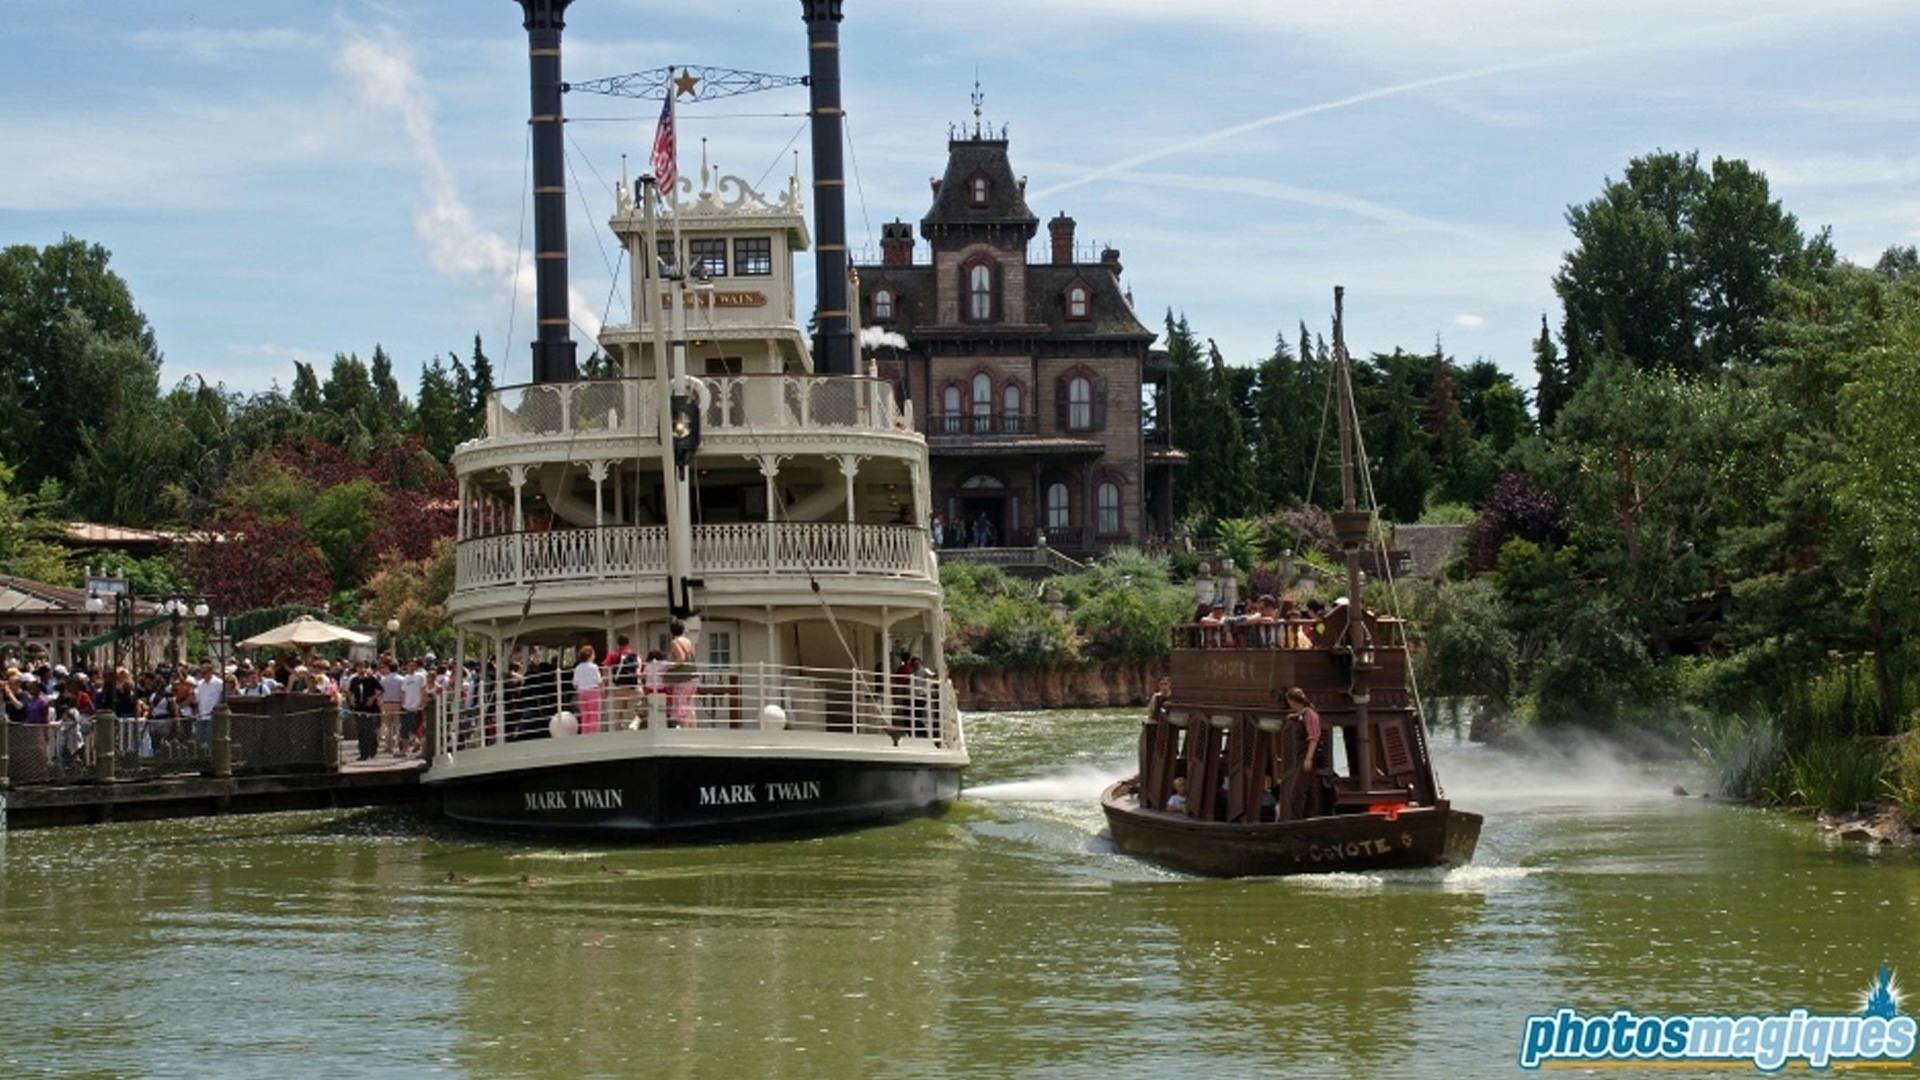 Mark twain Keelboats  Disneyland Paris